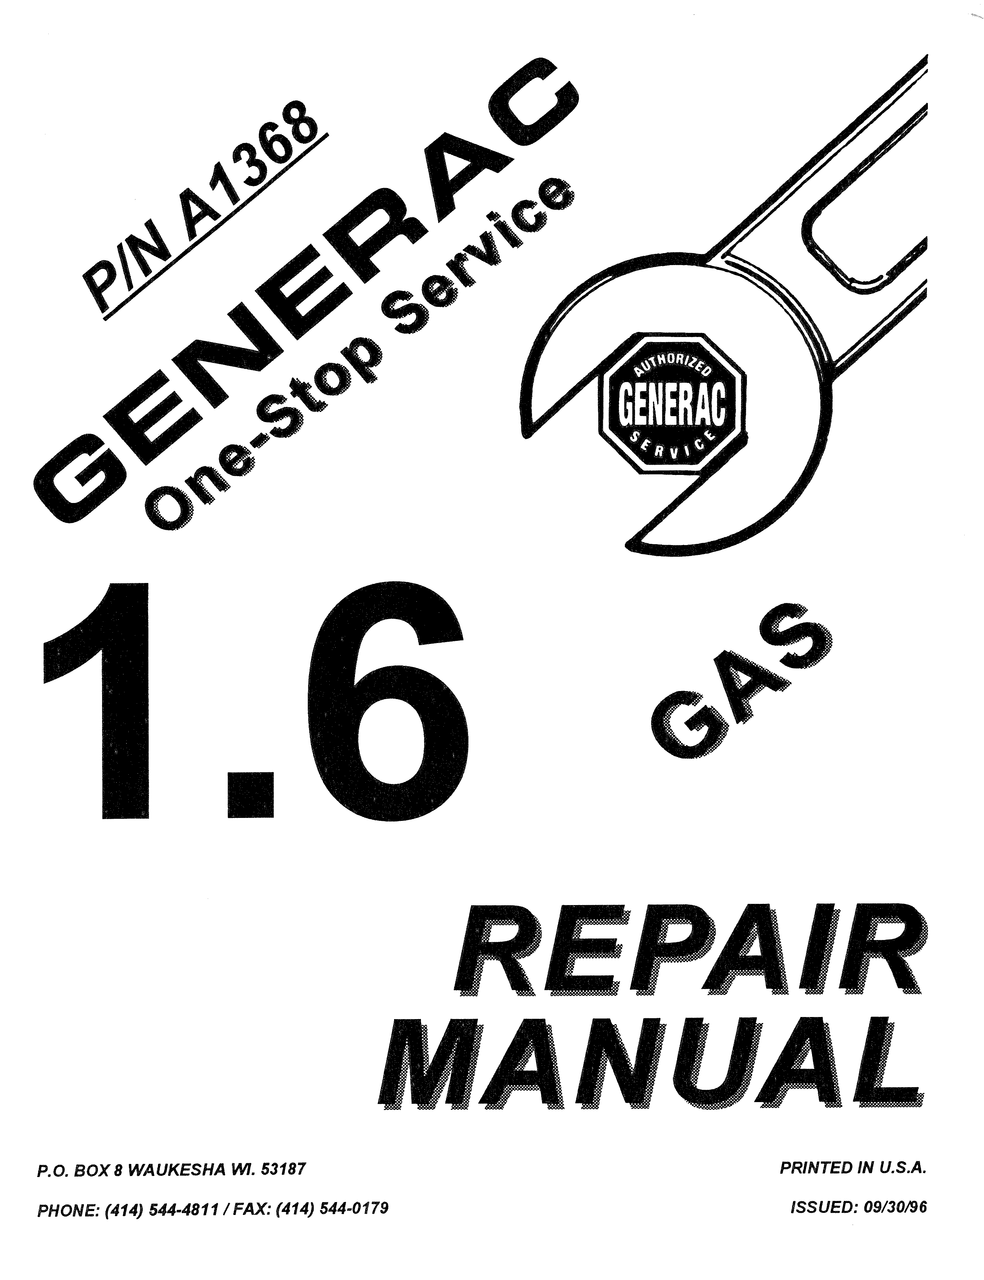 GENERAC 1.6 GAS ENGINE REPAIR MANUAL (0A1368)